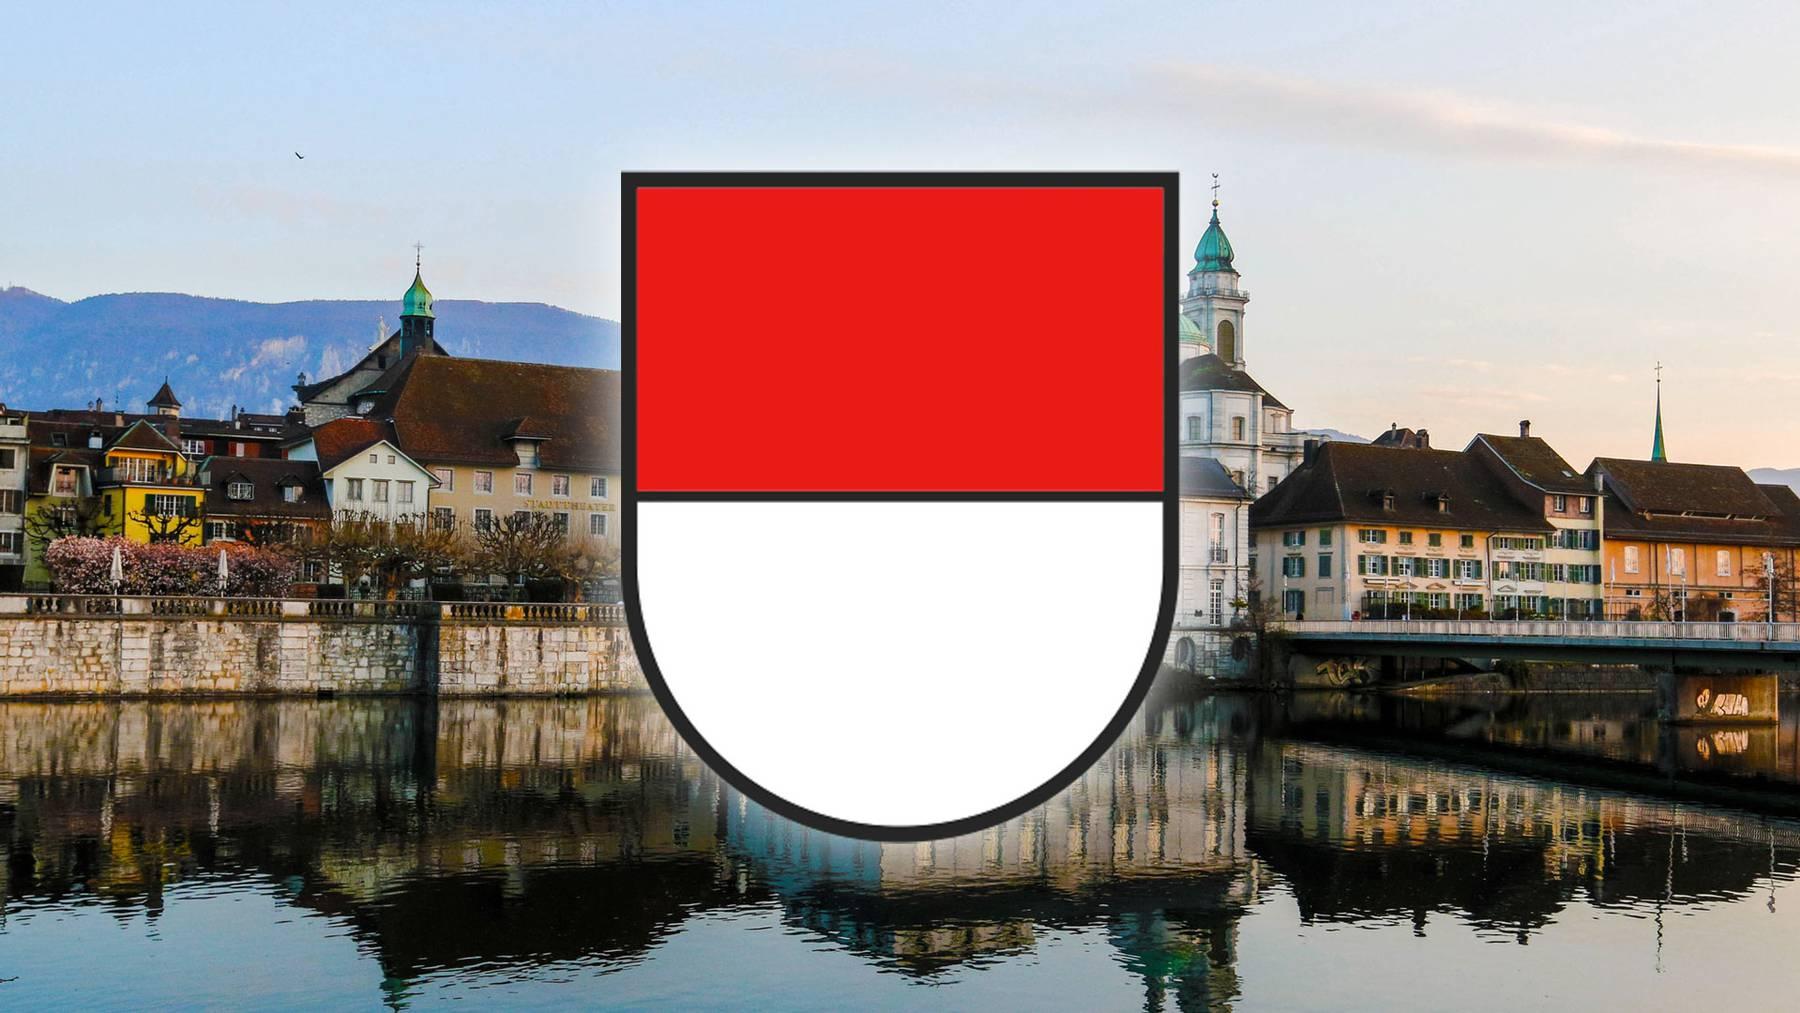 Kanton-Solothurn